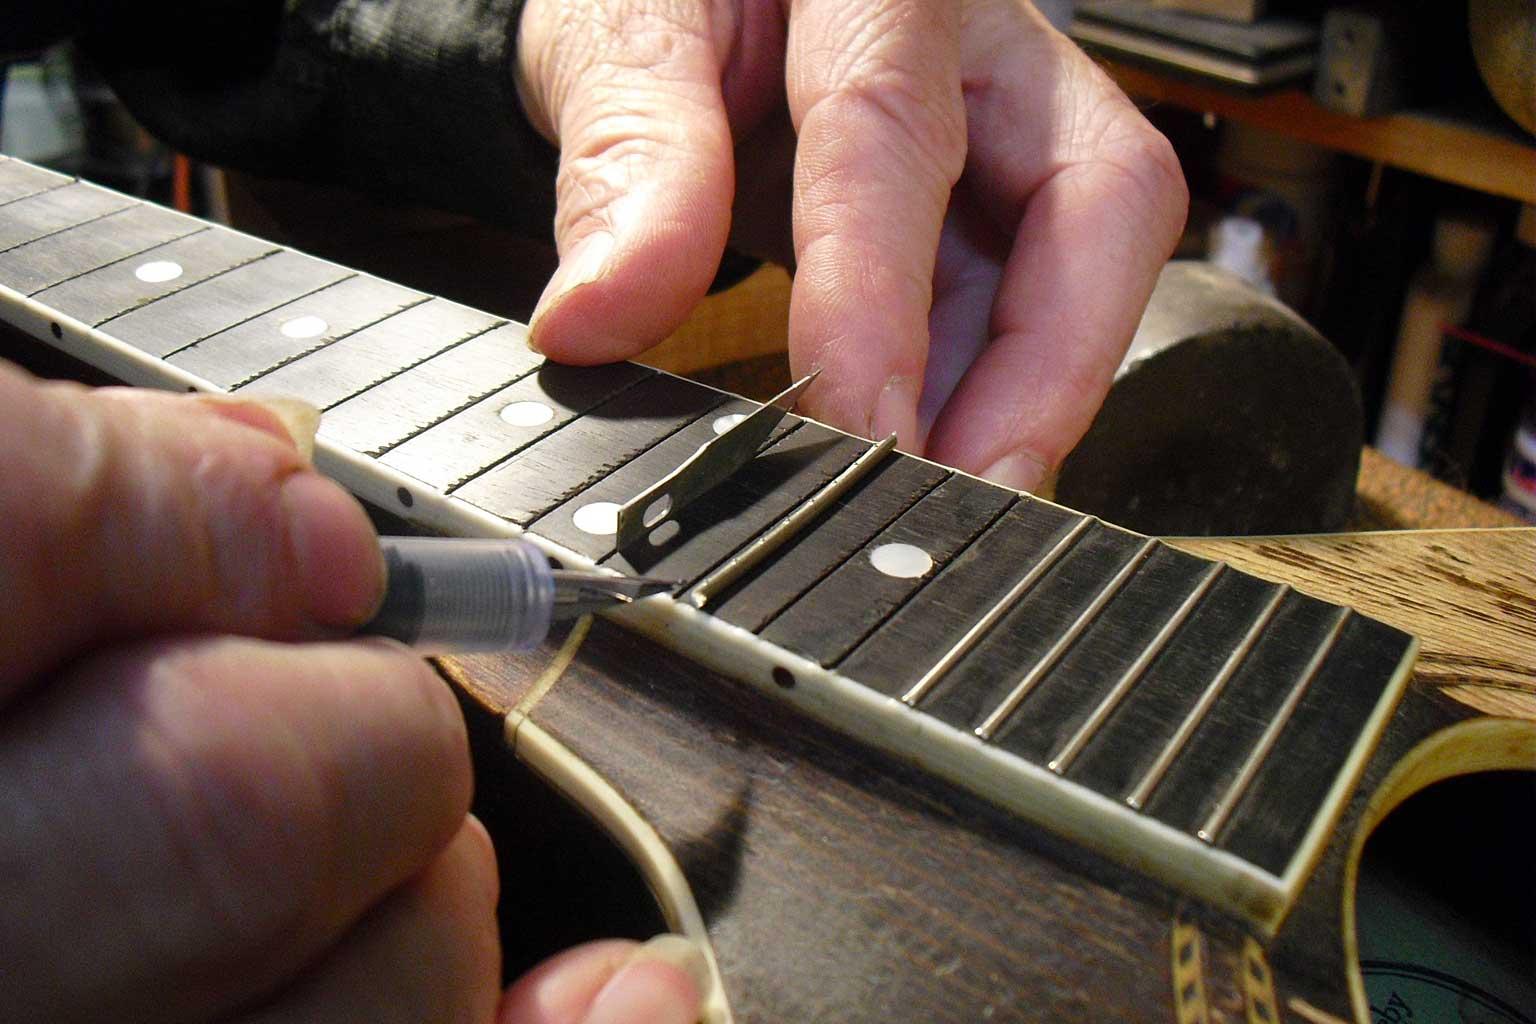 mandolin refret, guitar repair, action adjustment, martin service center, kline music, restoration, mandolin repairs